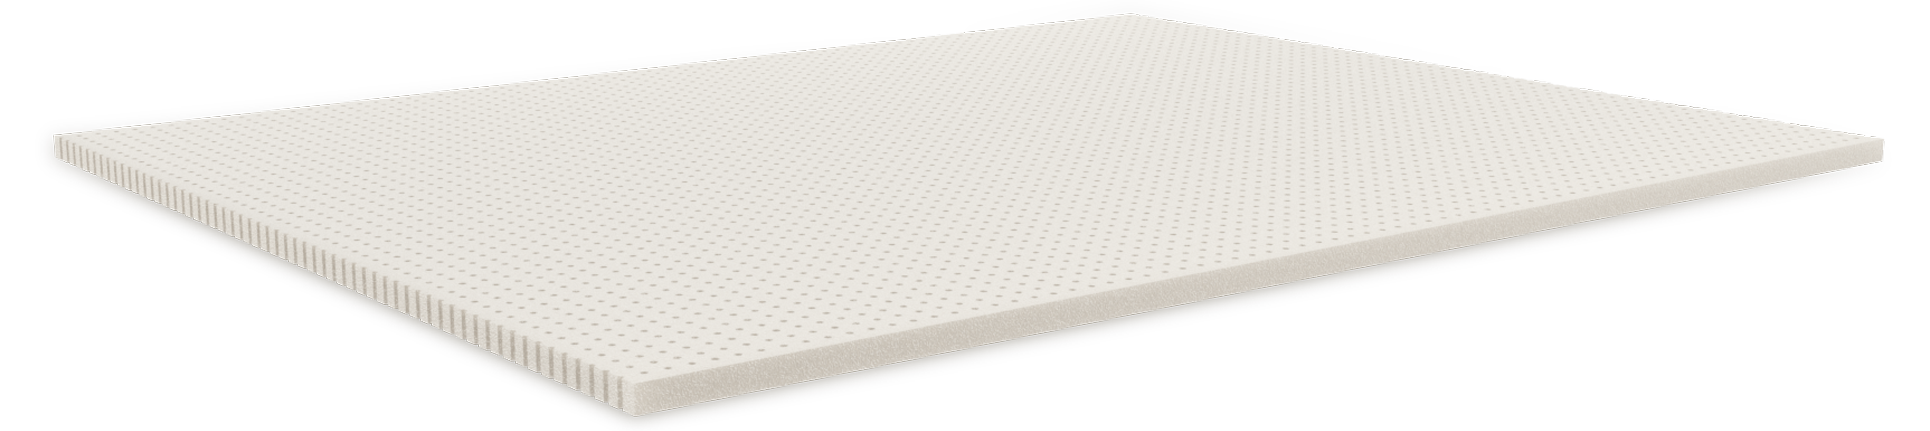 Mattress Layer 3 - Natural Latex